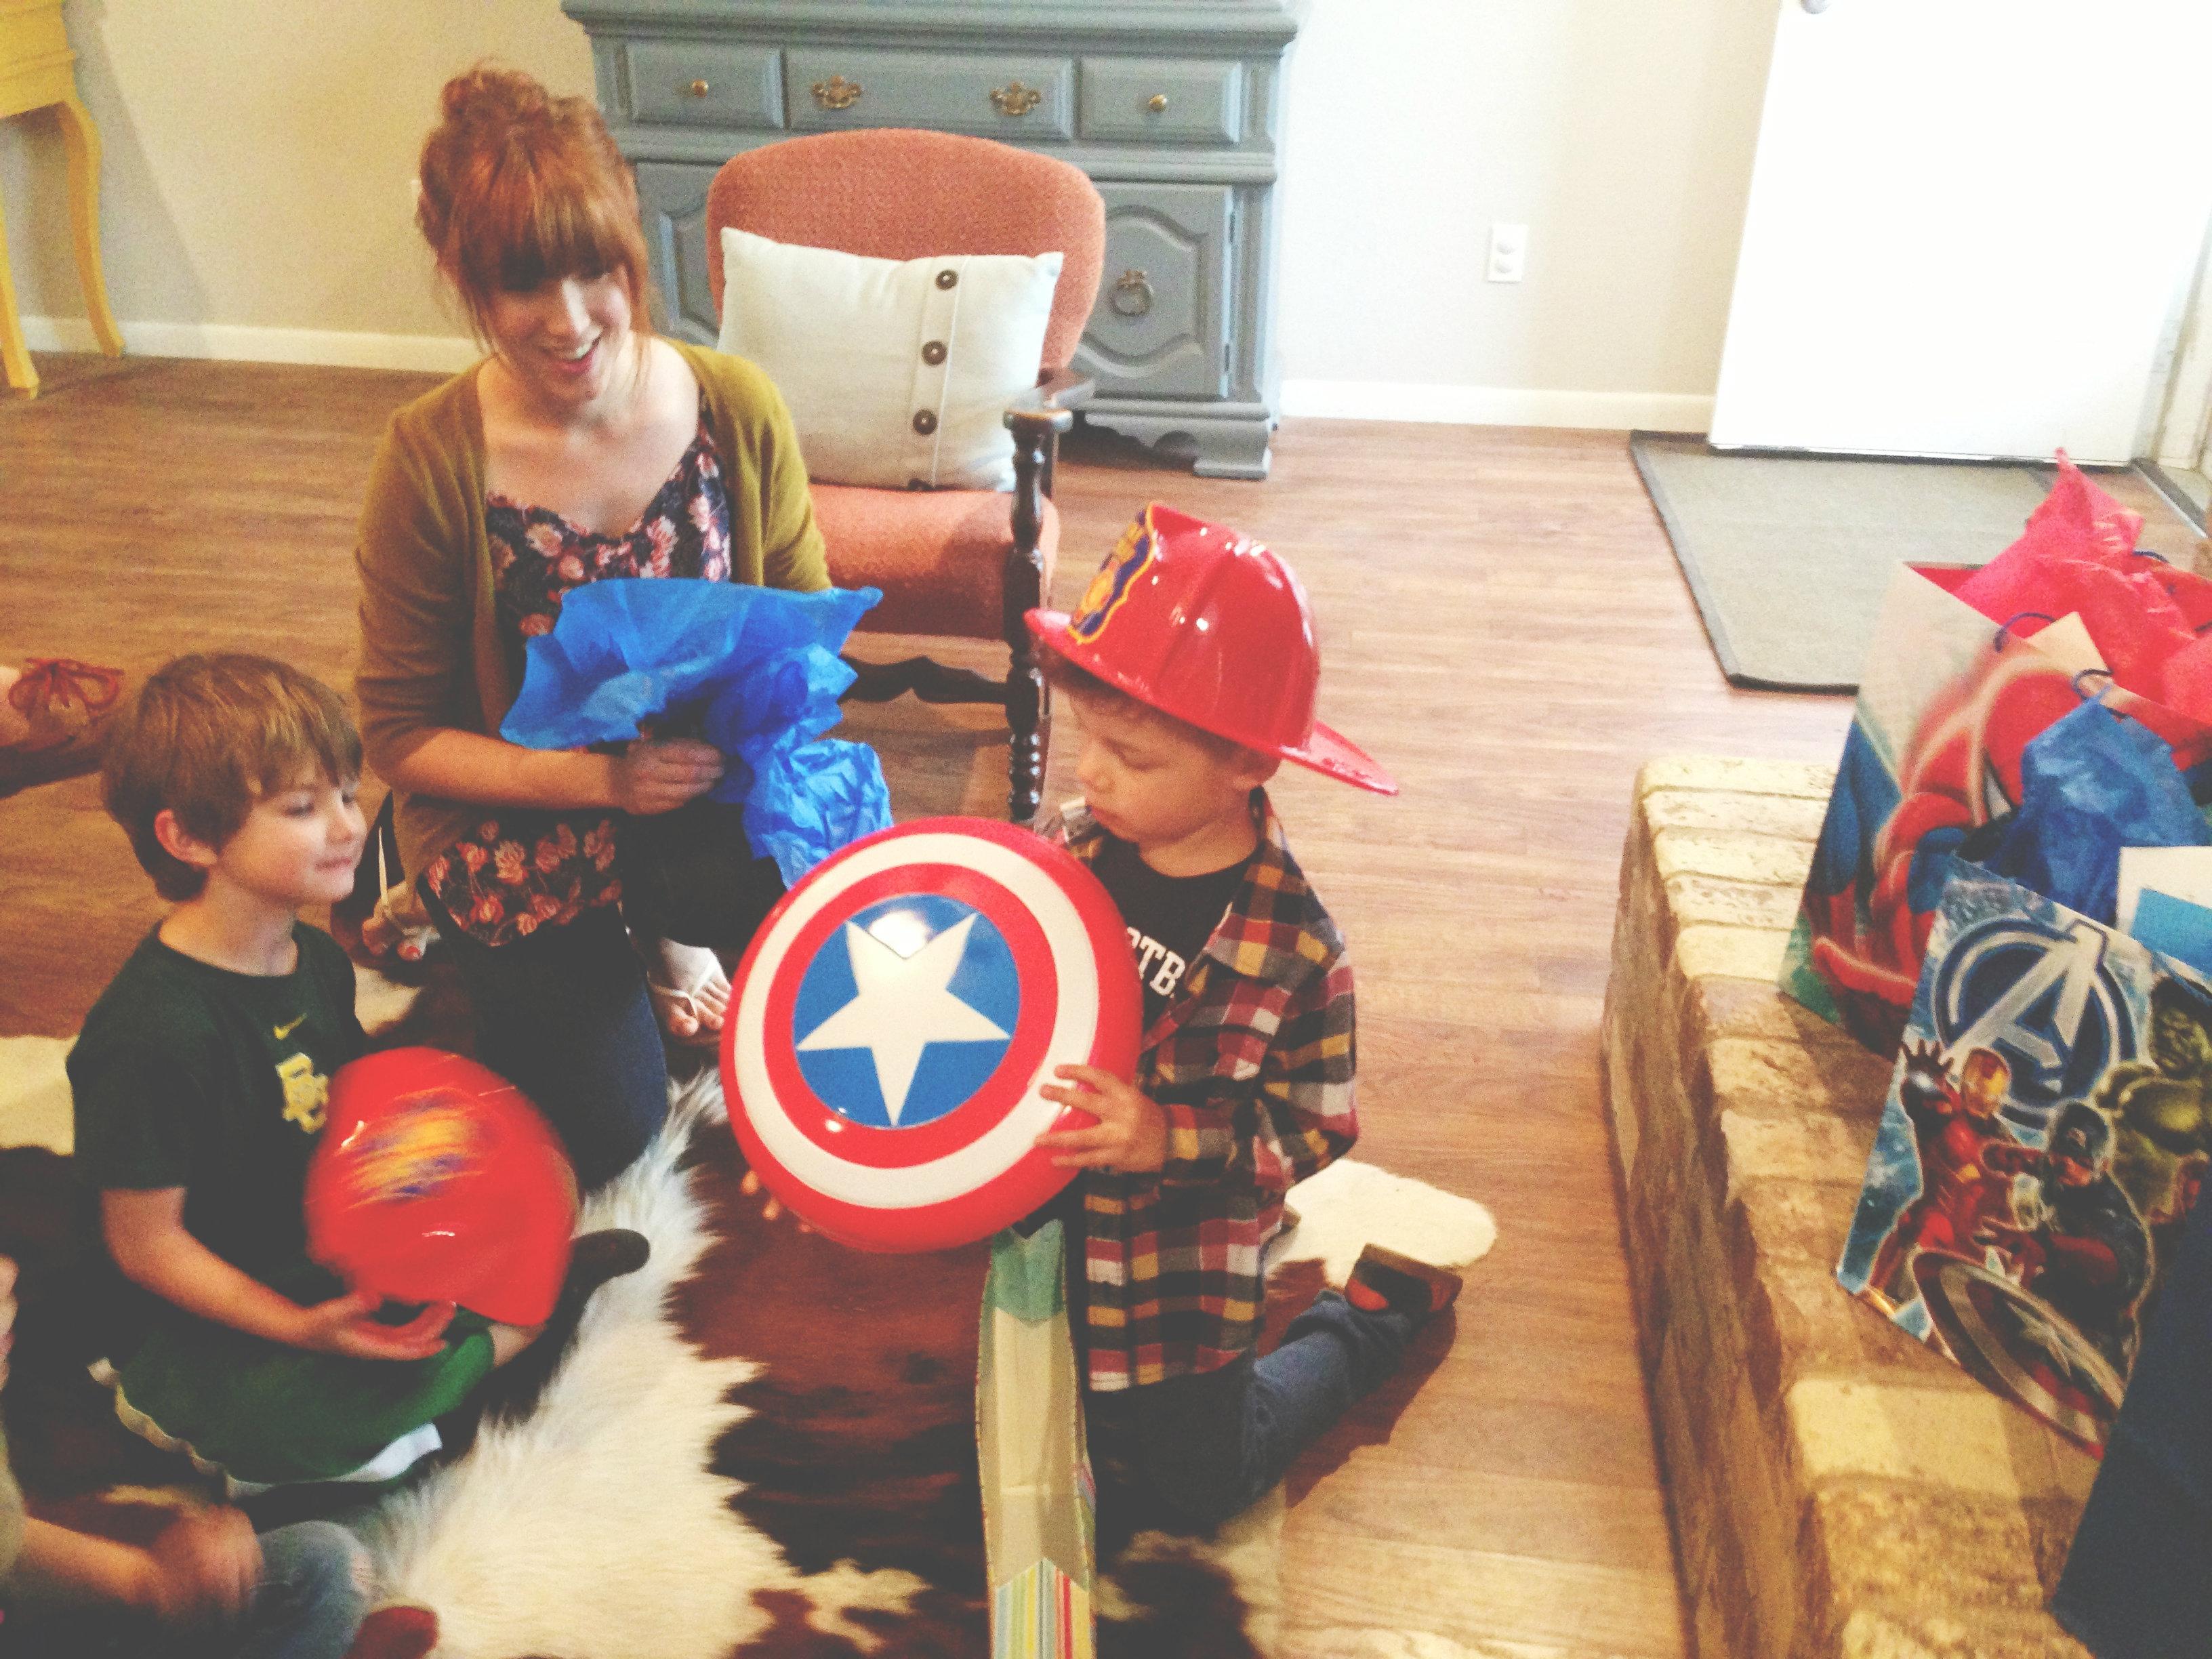 I spy a Capitan America costume